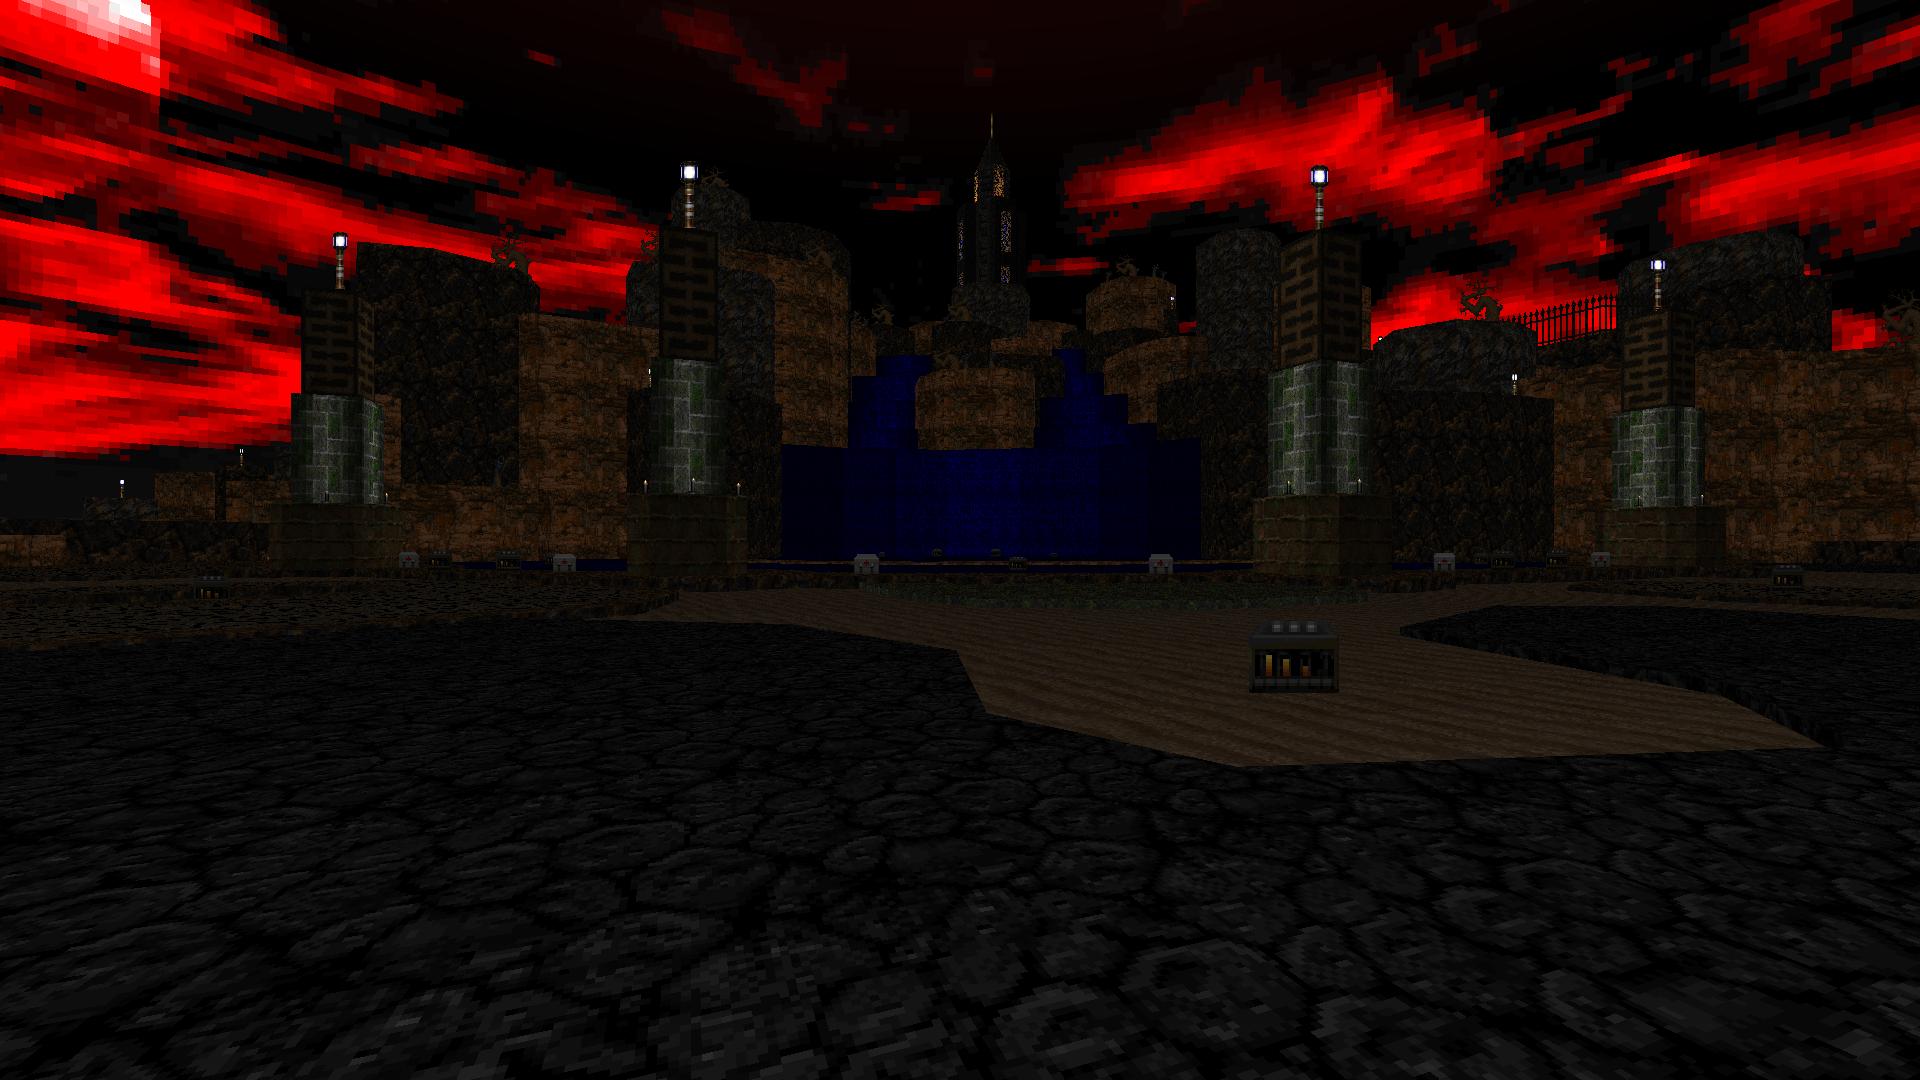 Screenshot_Doom_20210815_190923.png.9b5b2b6f95c0bf979e273e8dbc8f64ee.png